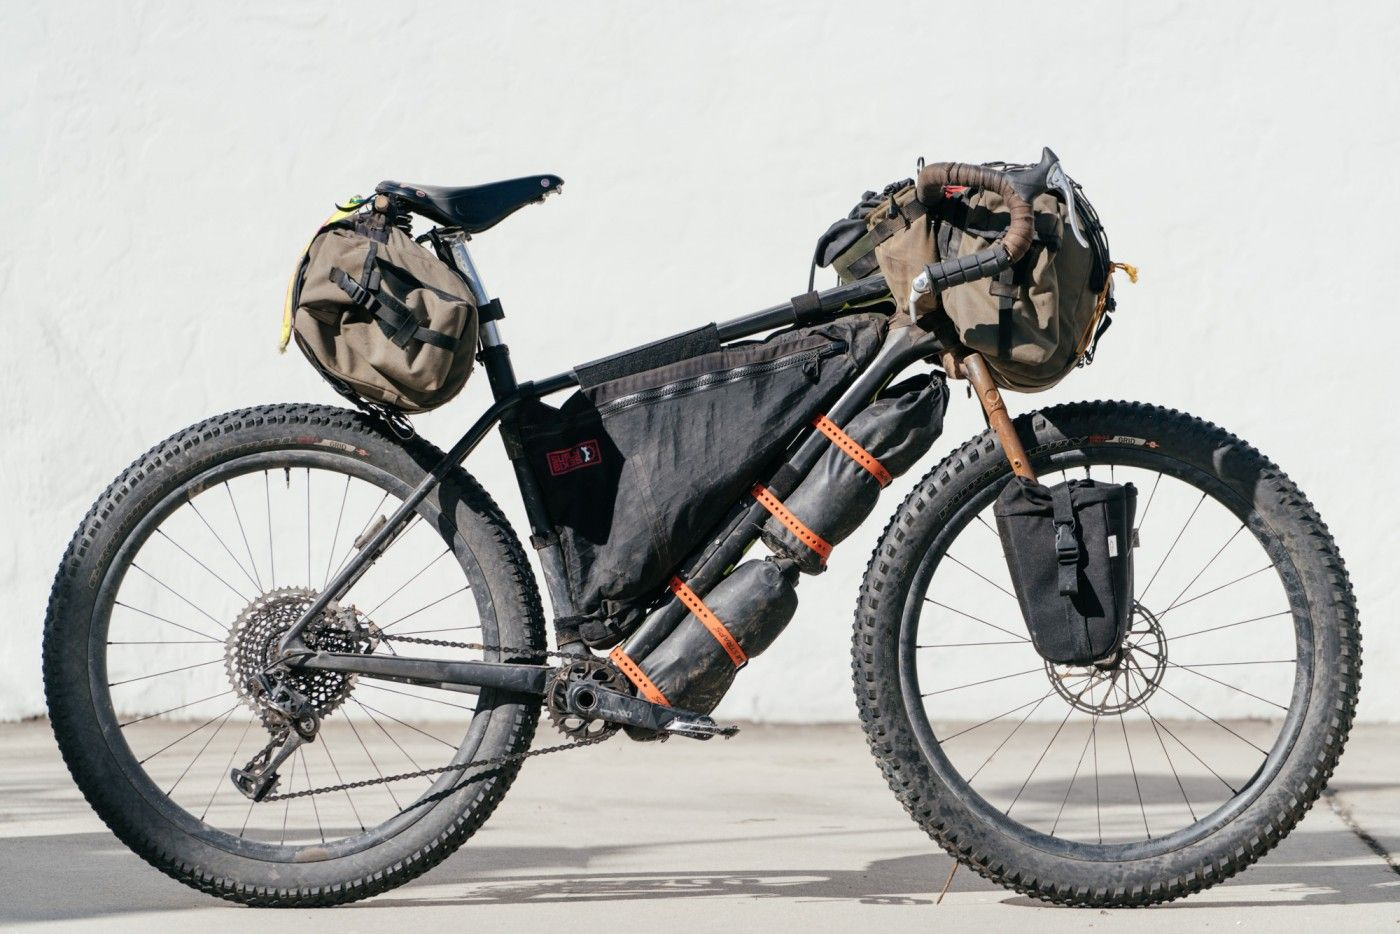 Benedict S 2020 S Works Fuse Ultra Baja Buggie Bike Camping